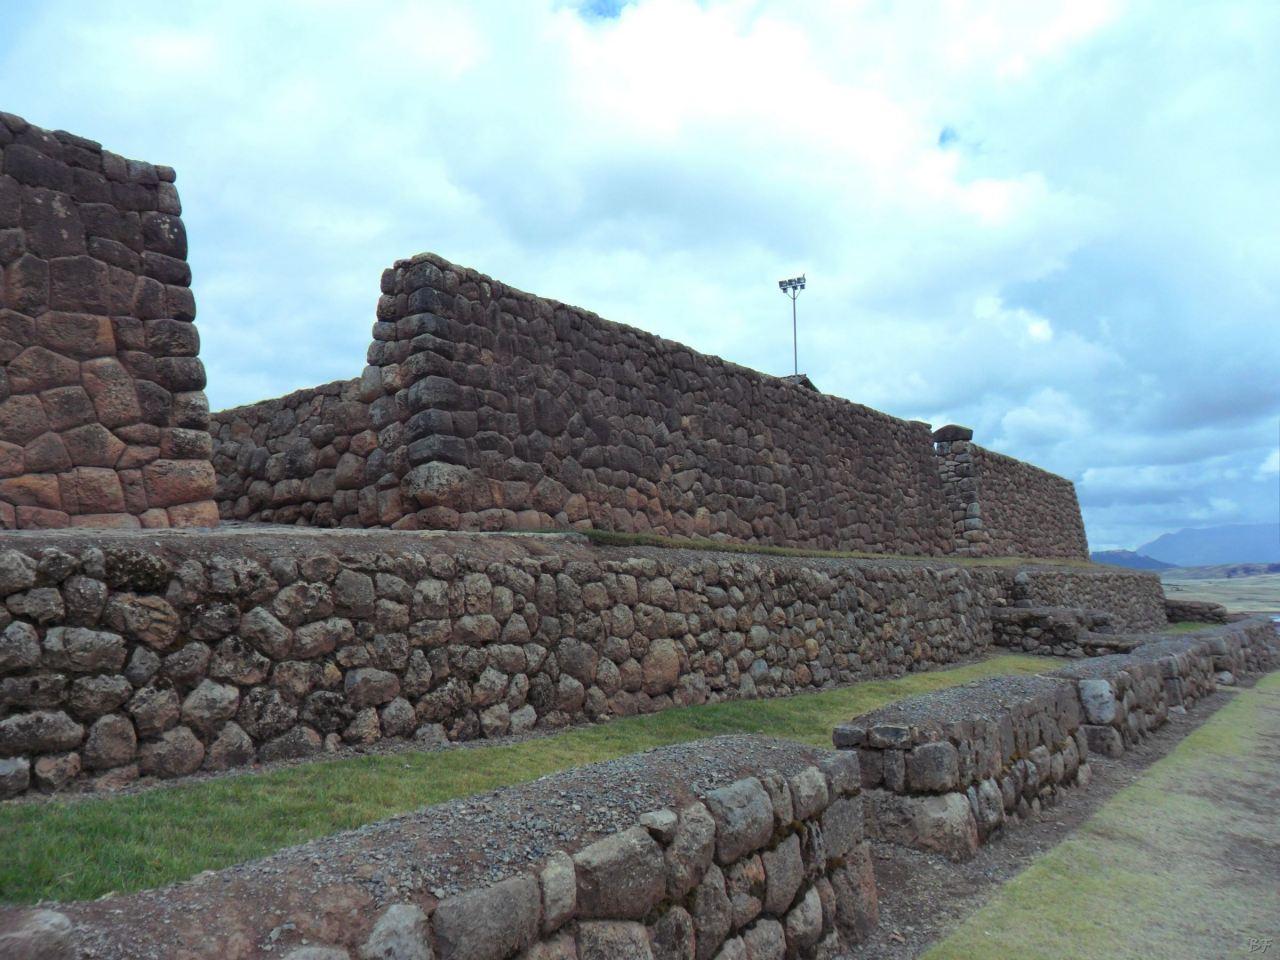 Chinchero-Mura-Poligonali-Piramide-Urubamba-Peru-5